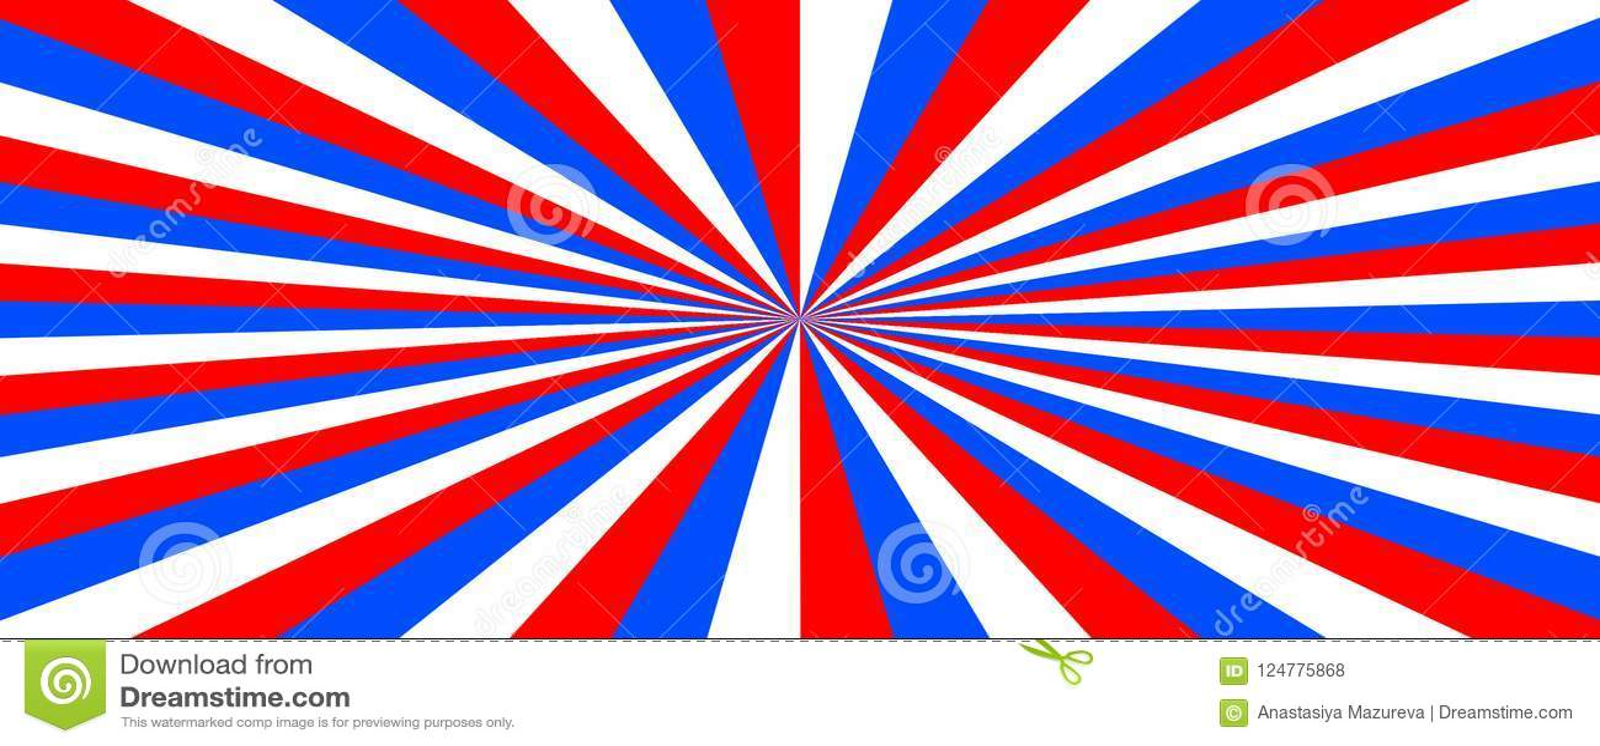 Tricolor Αφηρημένο υπόβαθρο με το χρώμα της σημαίας της Ρωσίας